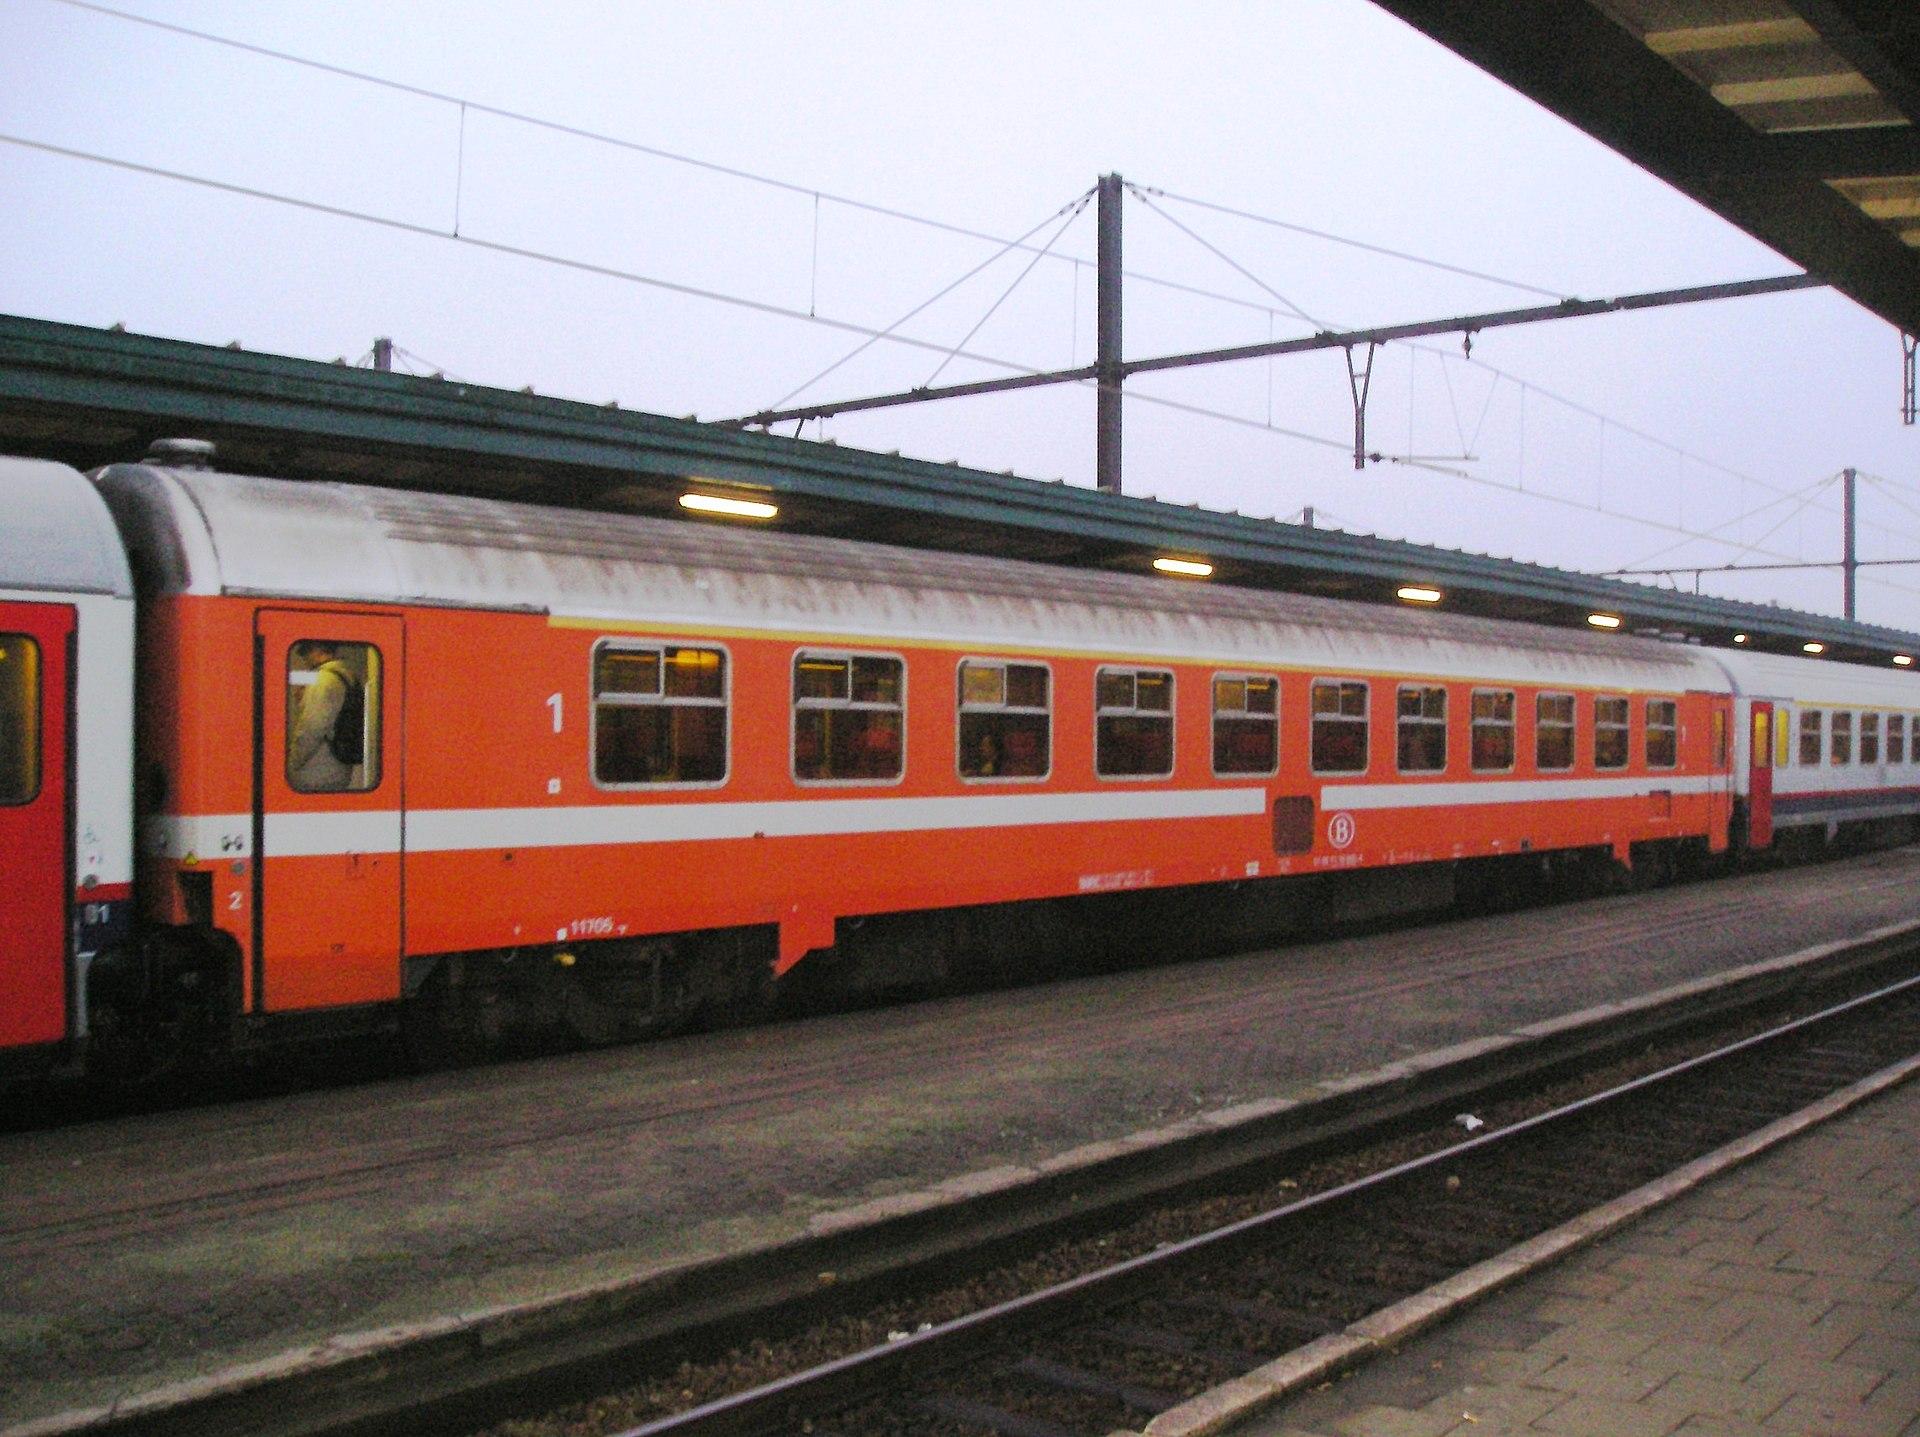 Vehicle - Rail - Passenger Car - UIC - Type Z (Eurofima)